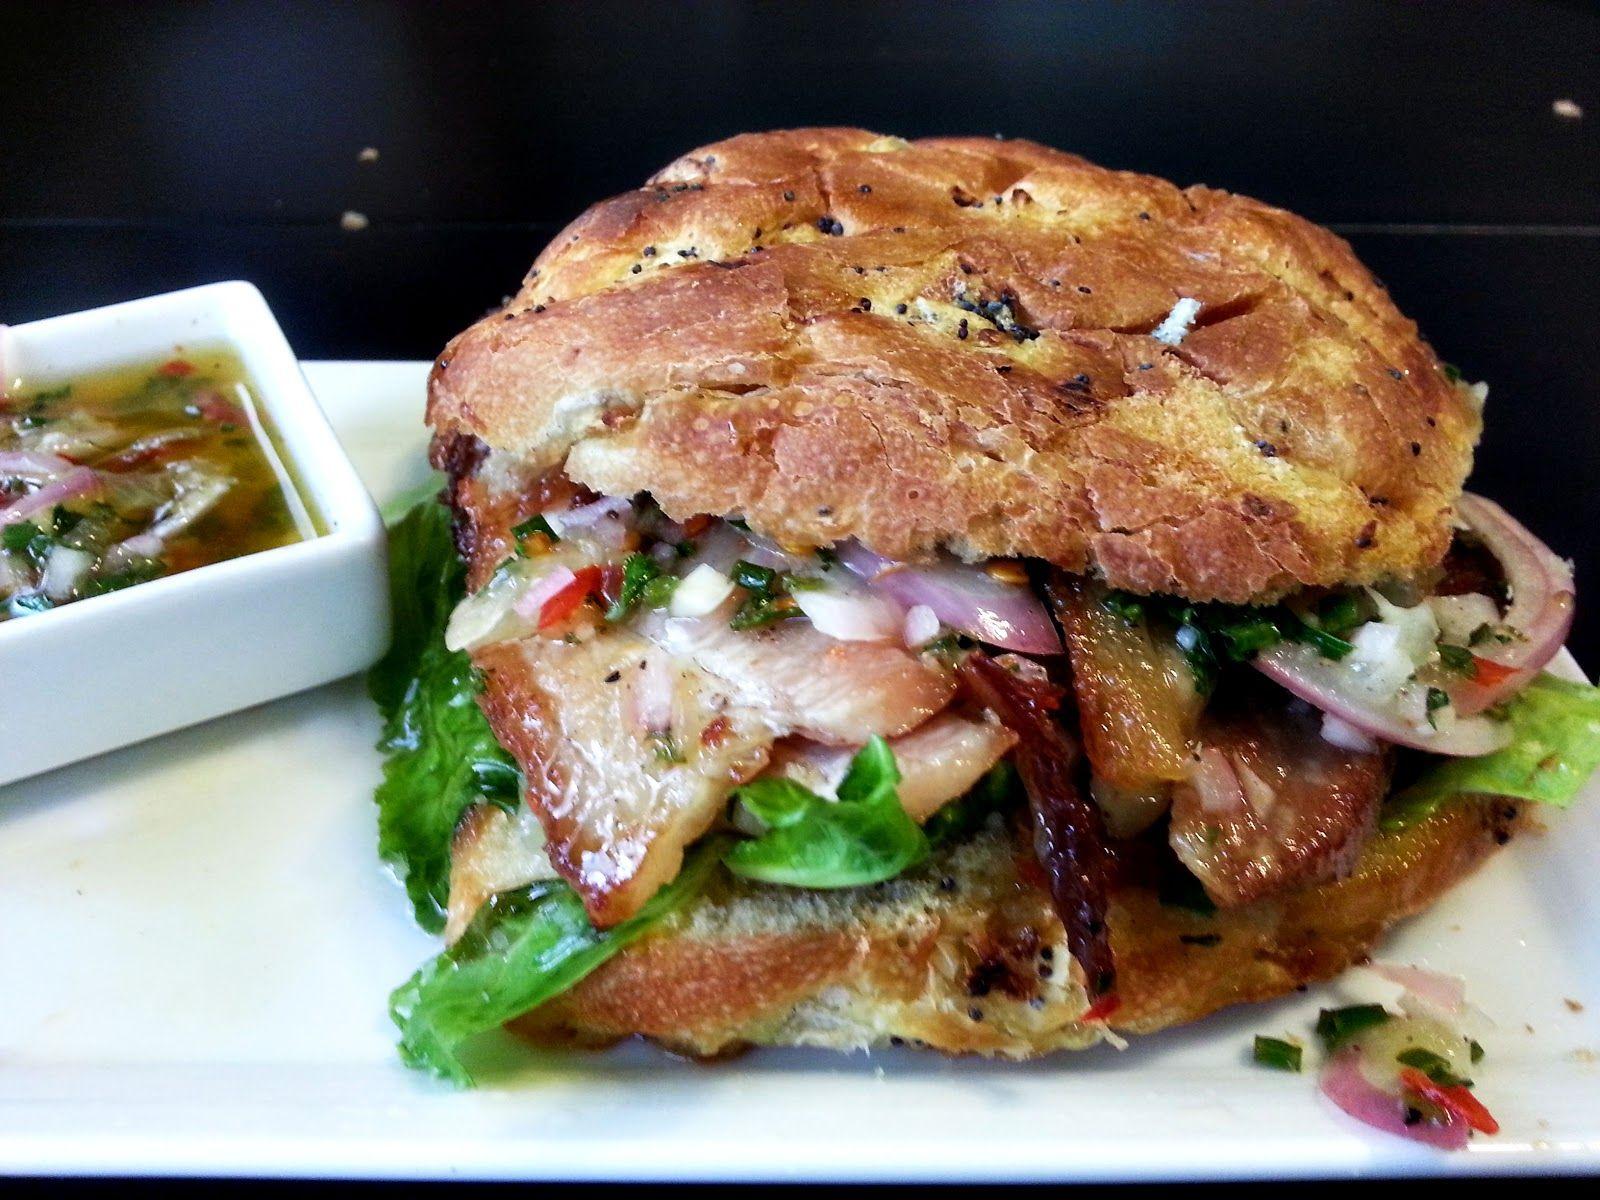 Crispy Pork Sandwiches recommendations